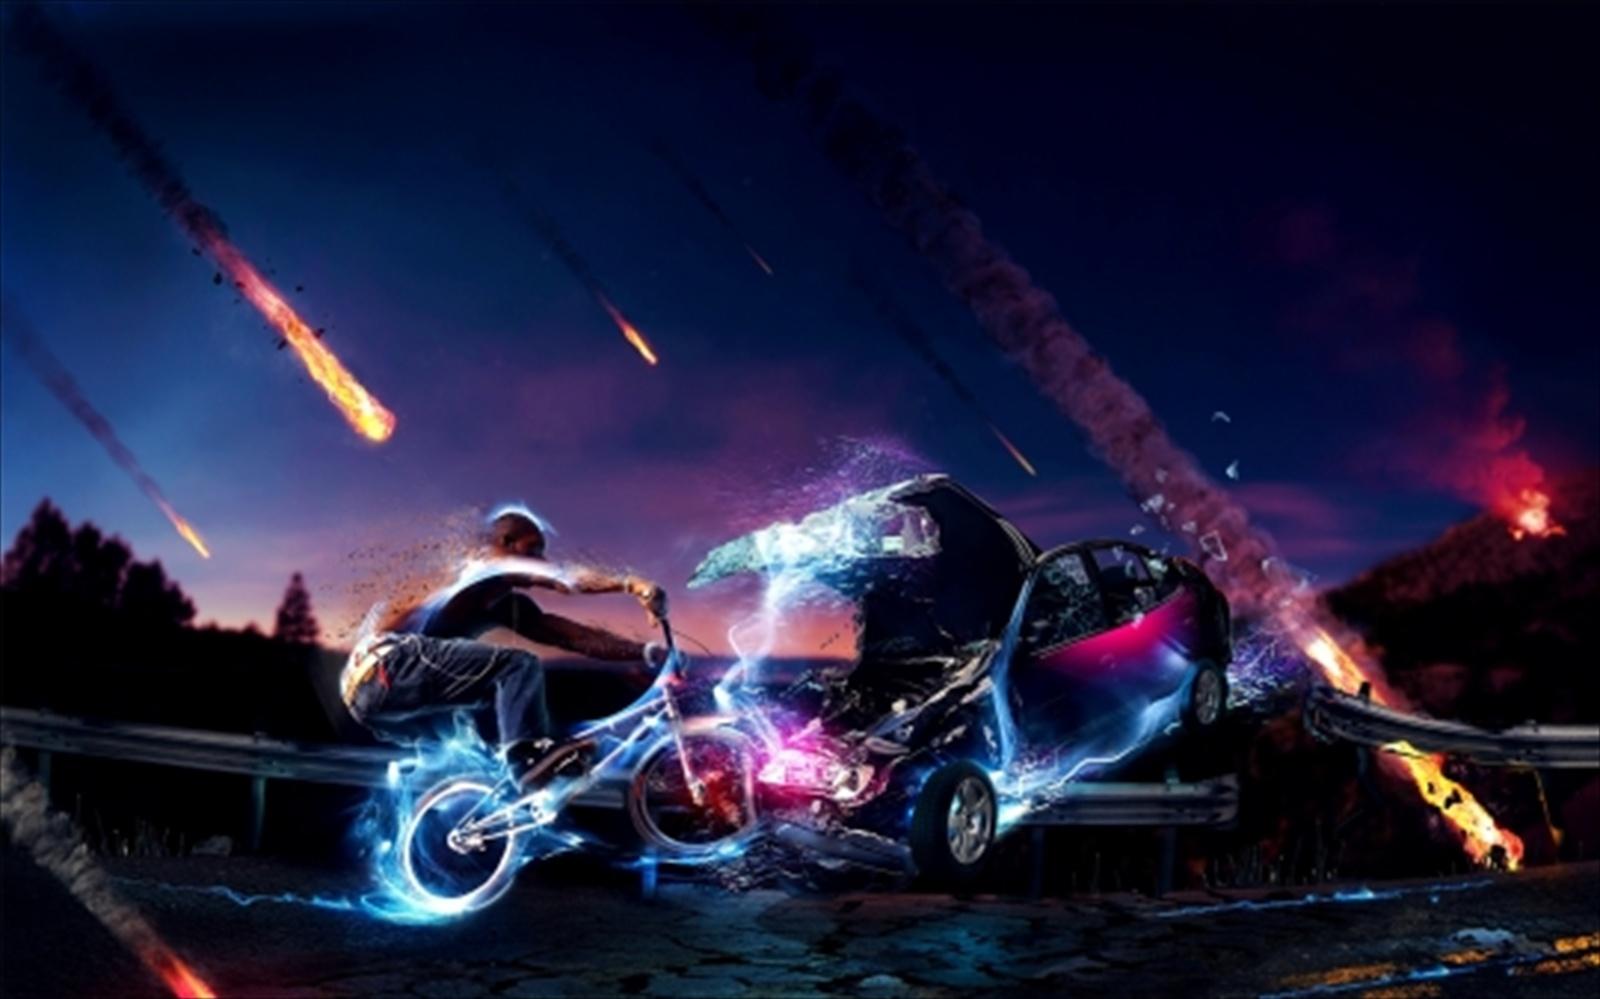 Atv Moto Crash Cars HD Wallpaper 999HDWallpaper Imagenes 1600x999